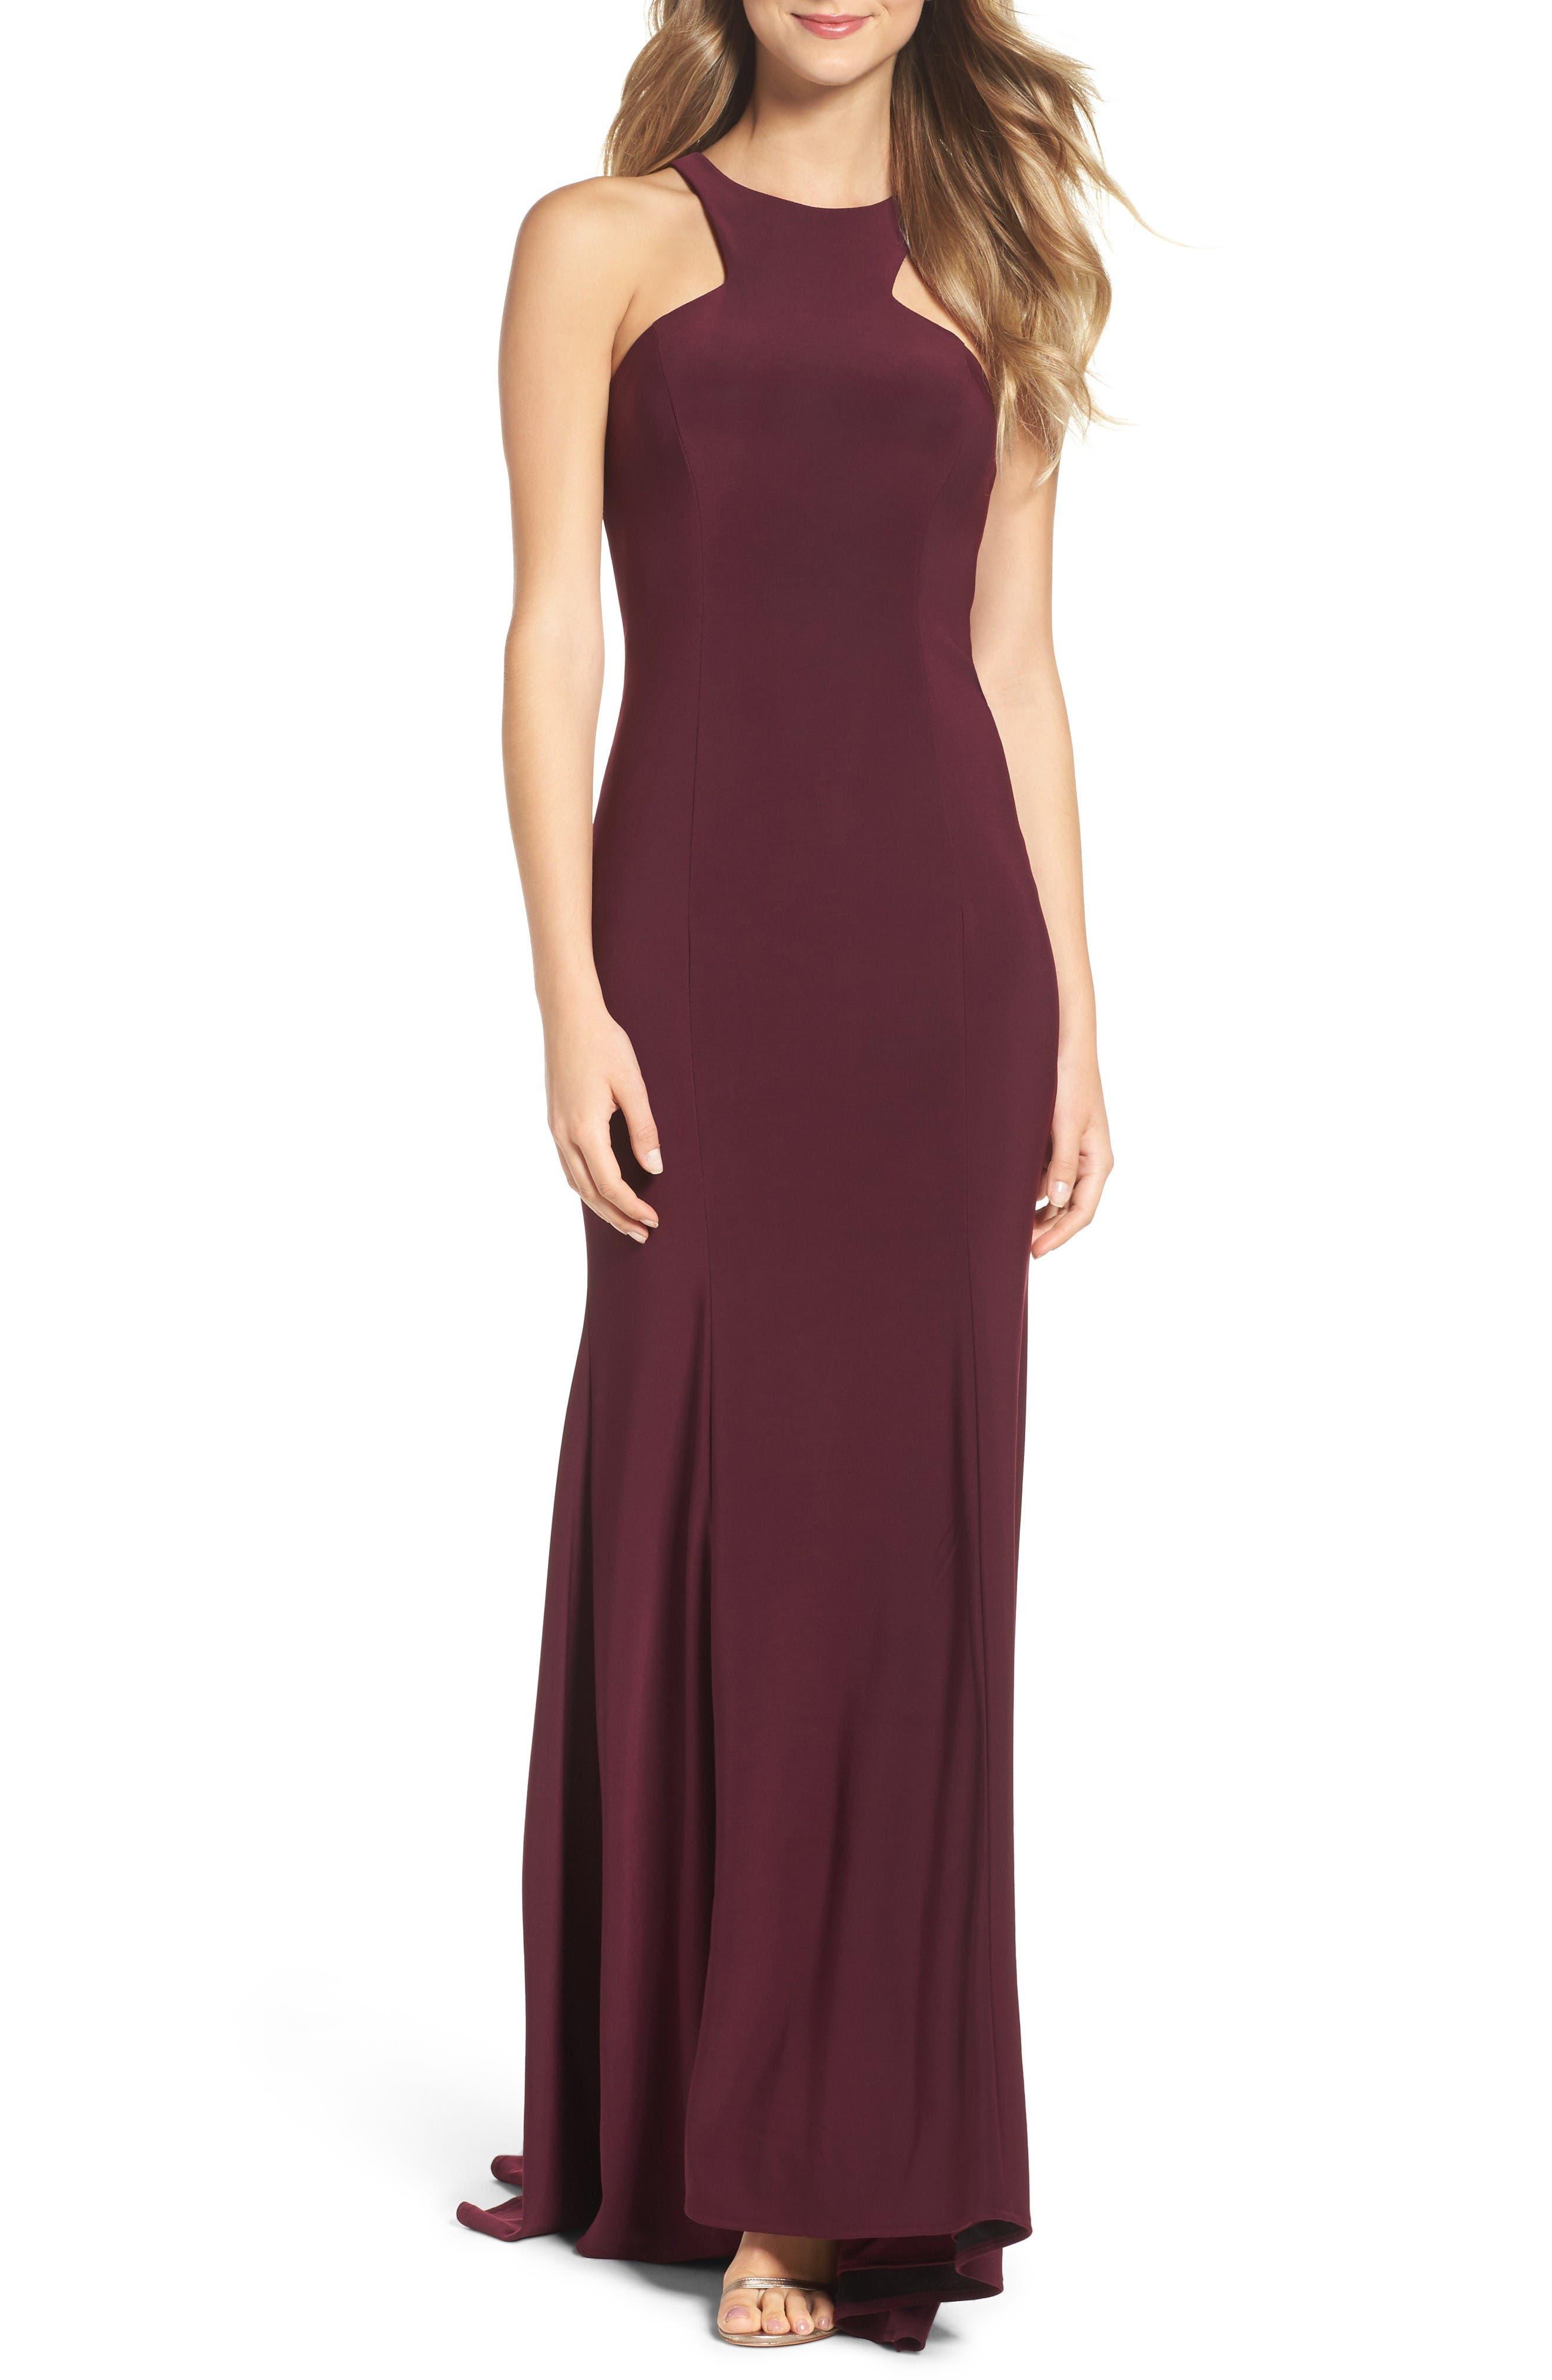 Alternate Image 1 Selected - Xscape Jersey Cutout Bodice Gown (Regular & Petite)